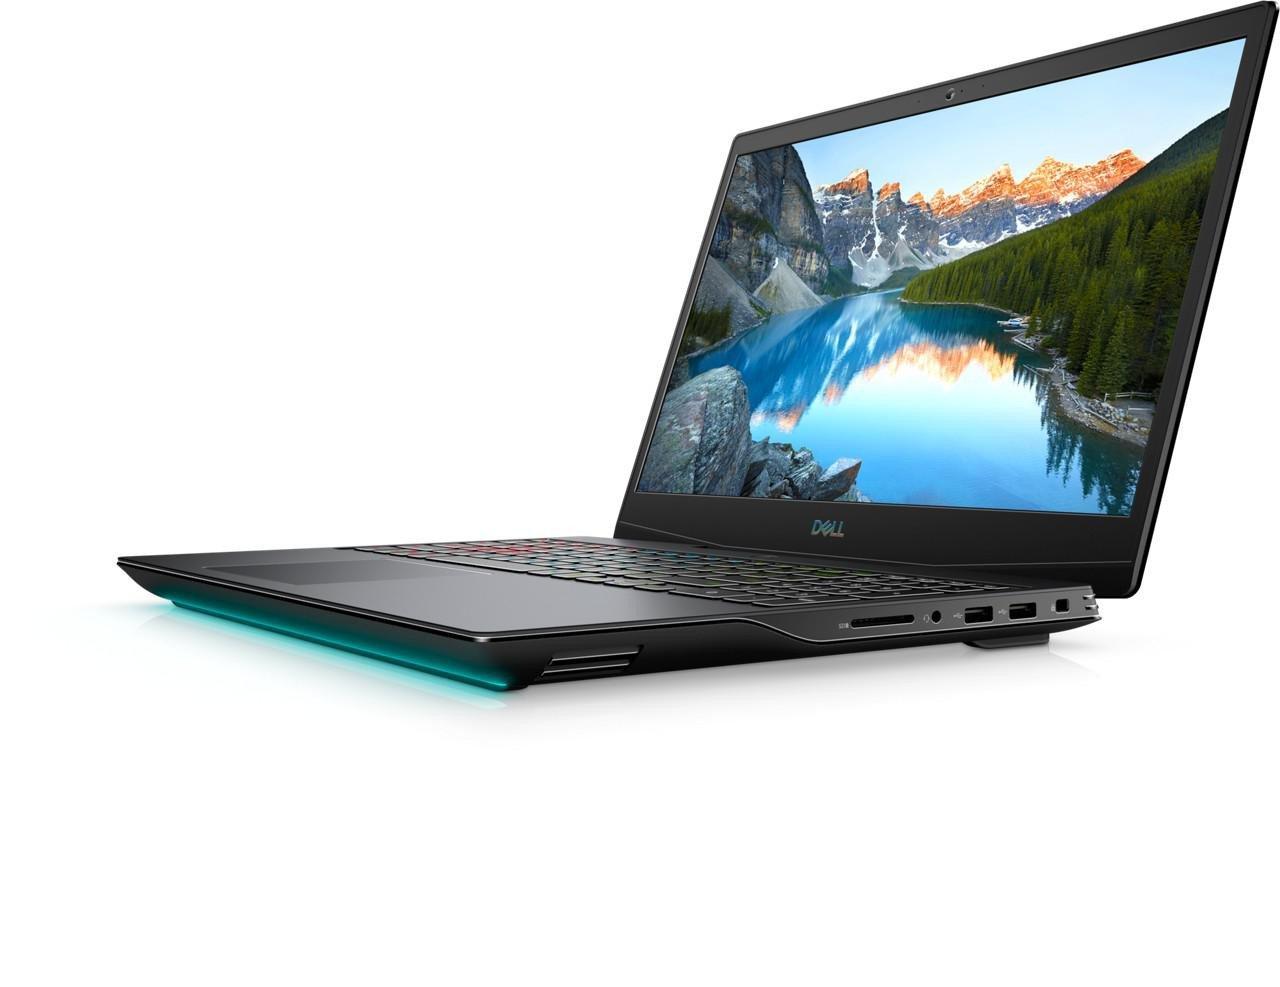 "Laptop Dell Inspiron Gaming 5500 G5, 15.6"" FHD, i5-10300H, 8GB, 512GB SSD, GeForce GTX 1650TI, Ubuntu - imaginea 8"